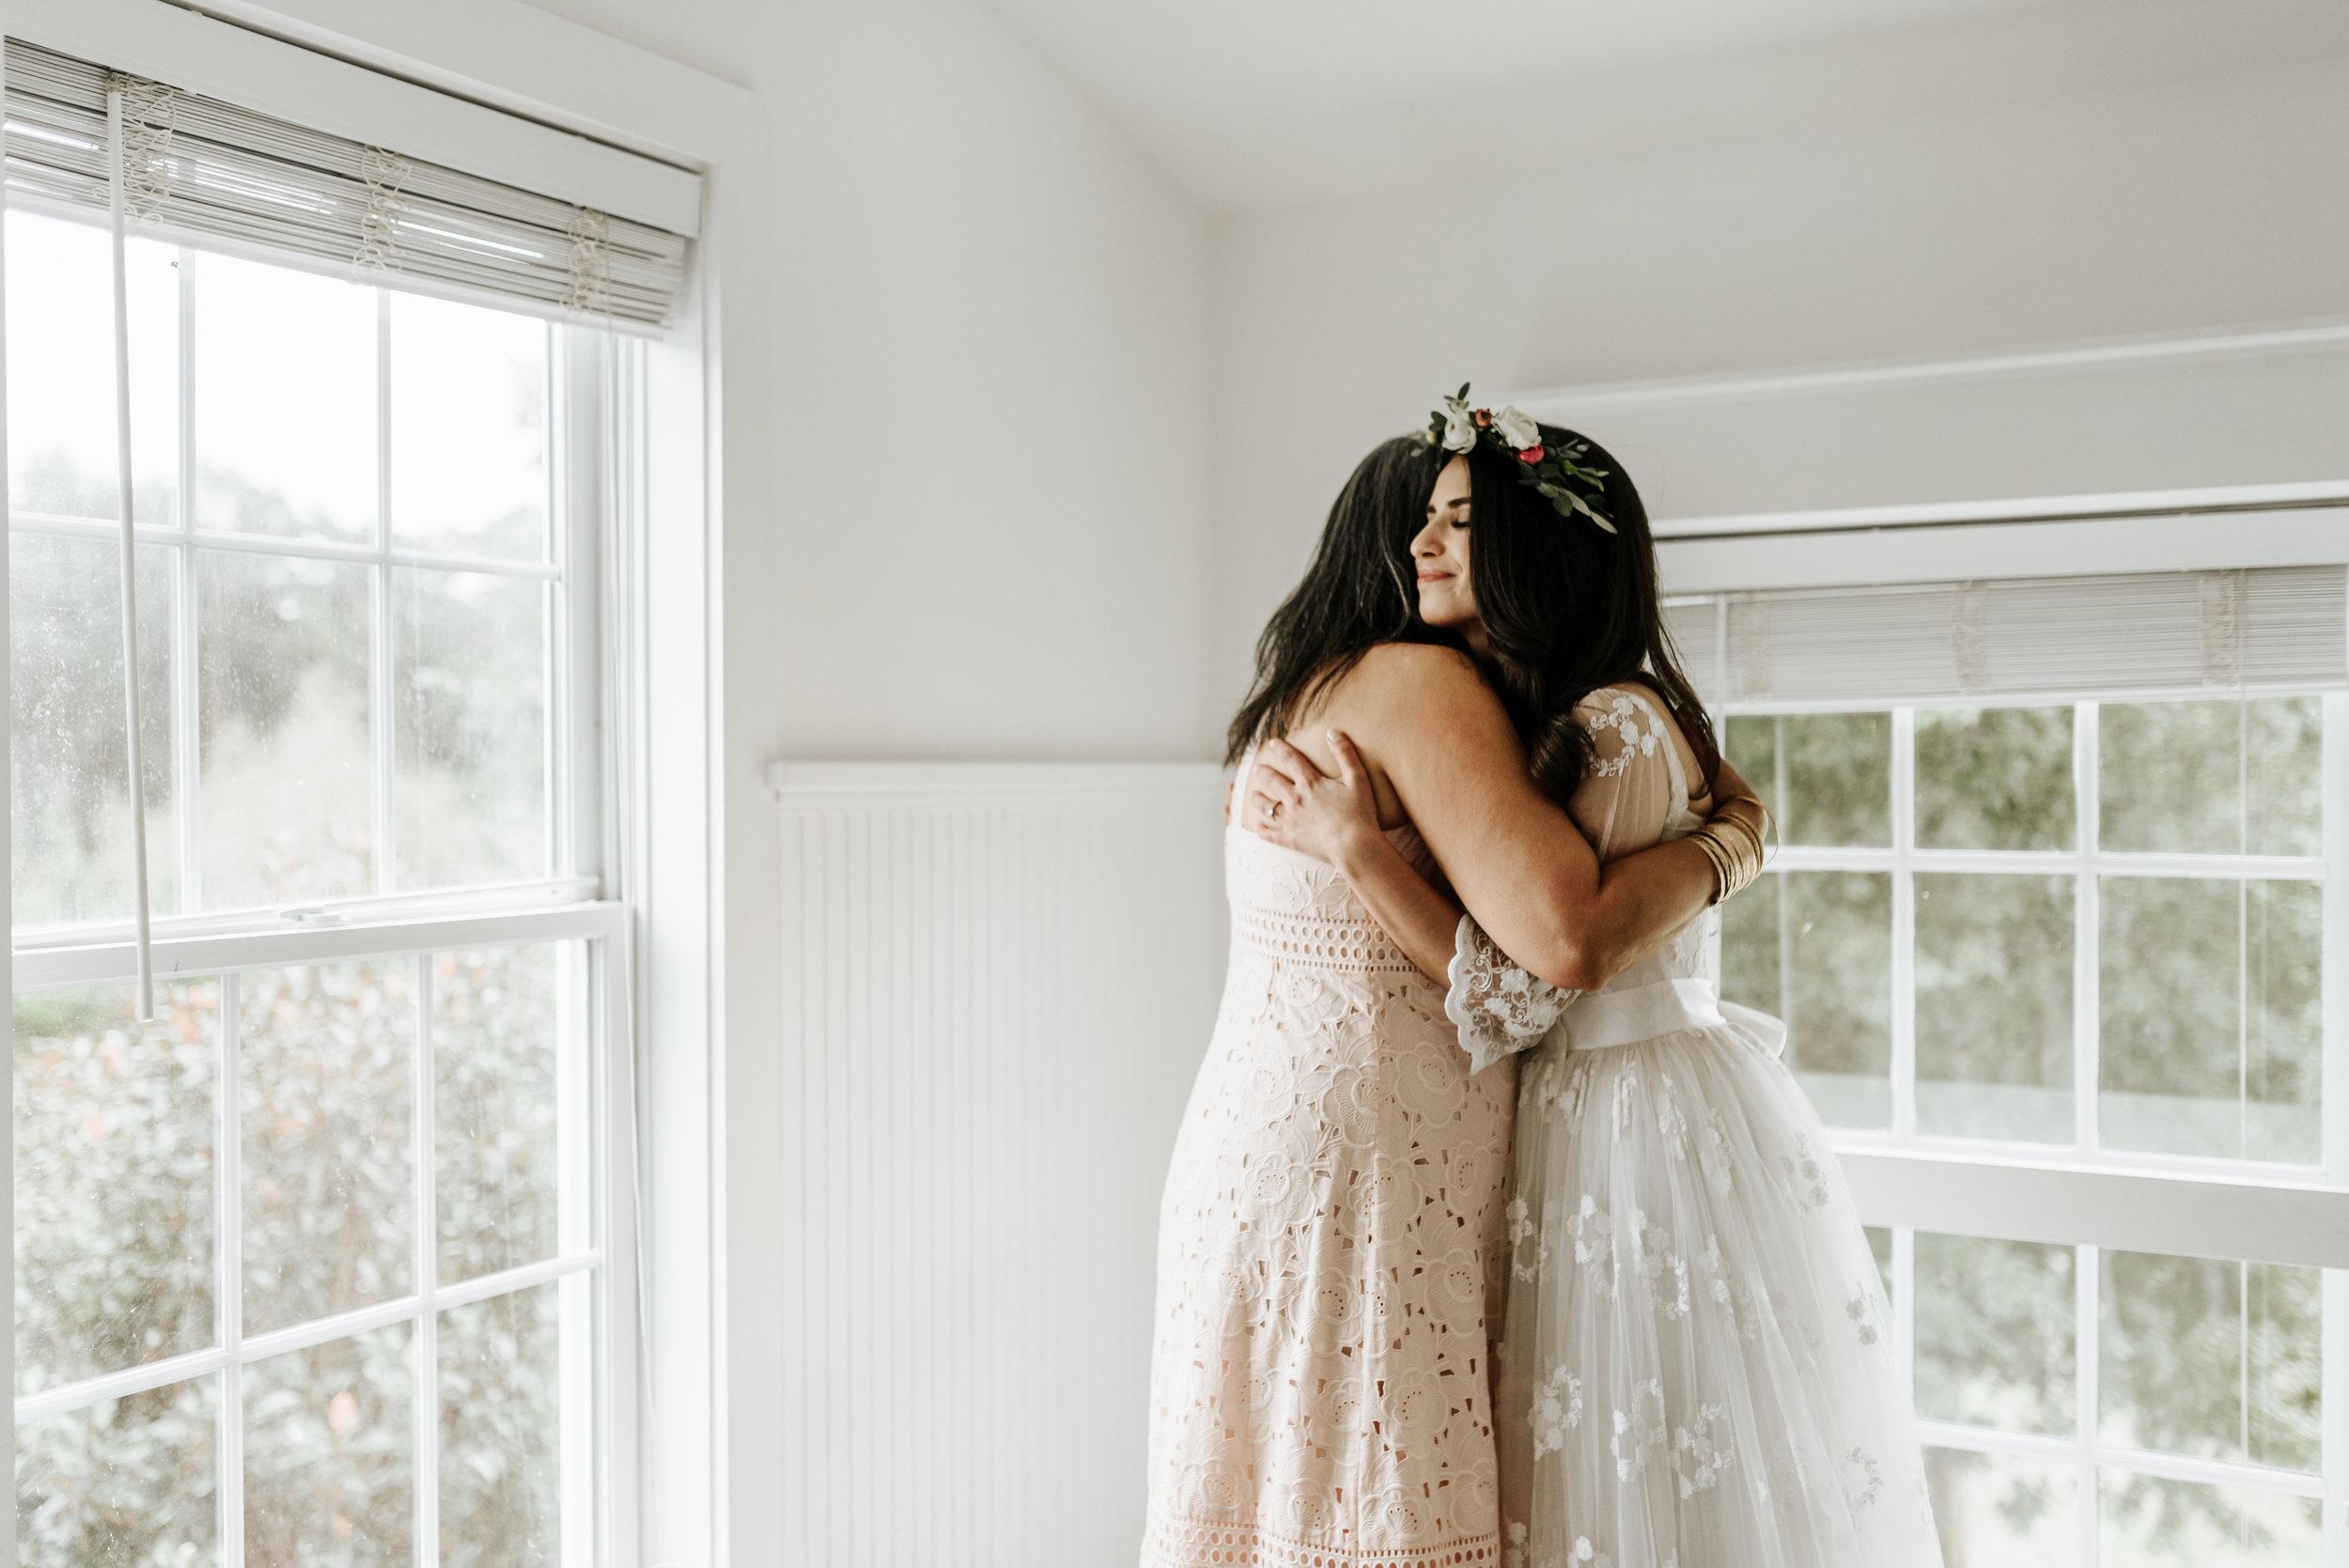 Veritas-Vineyards-and-Winery-Wedding-Photography-Afton-Virginia-Yasmin-Seth-Photography-by-V-9132.jpg